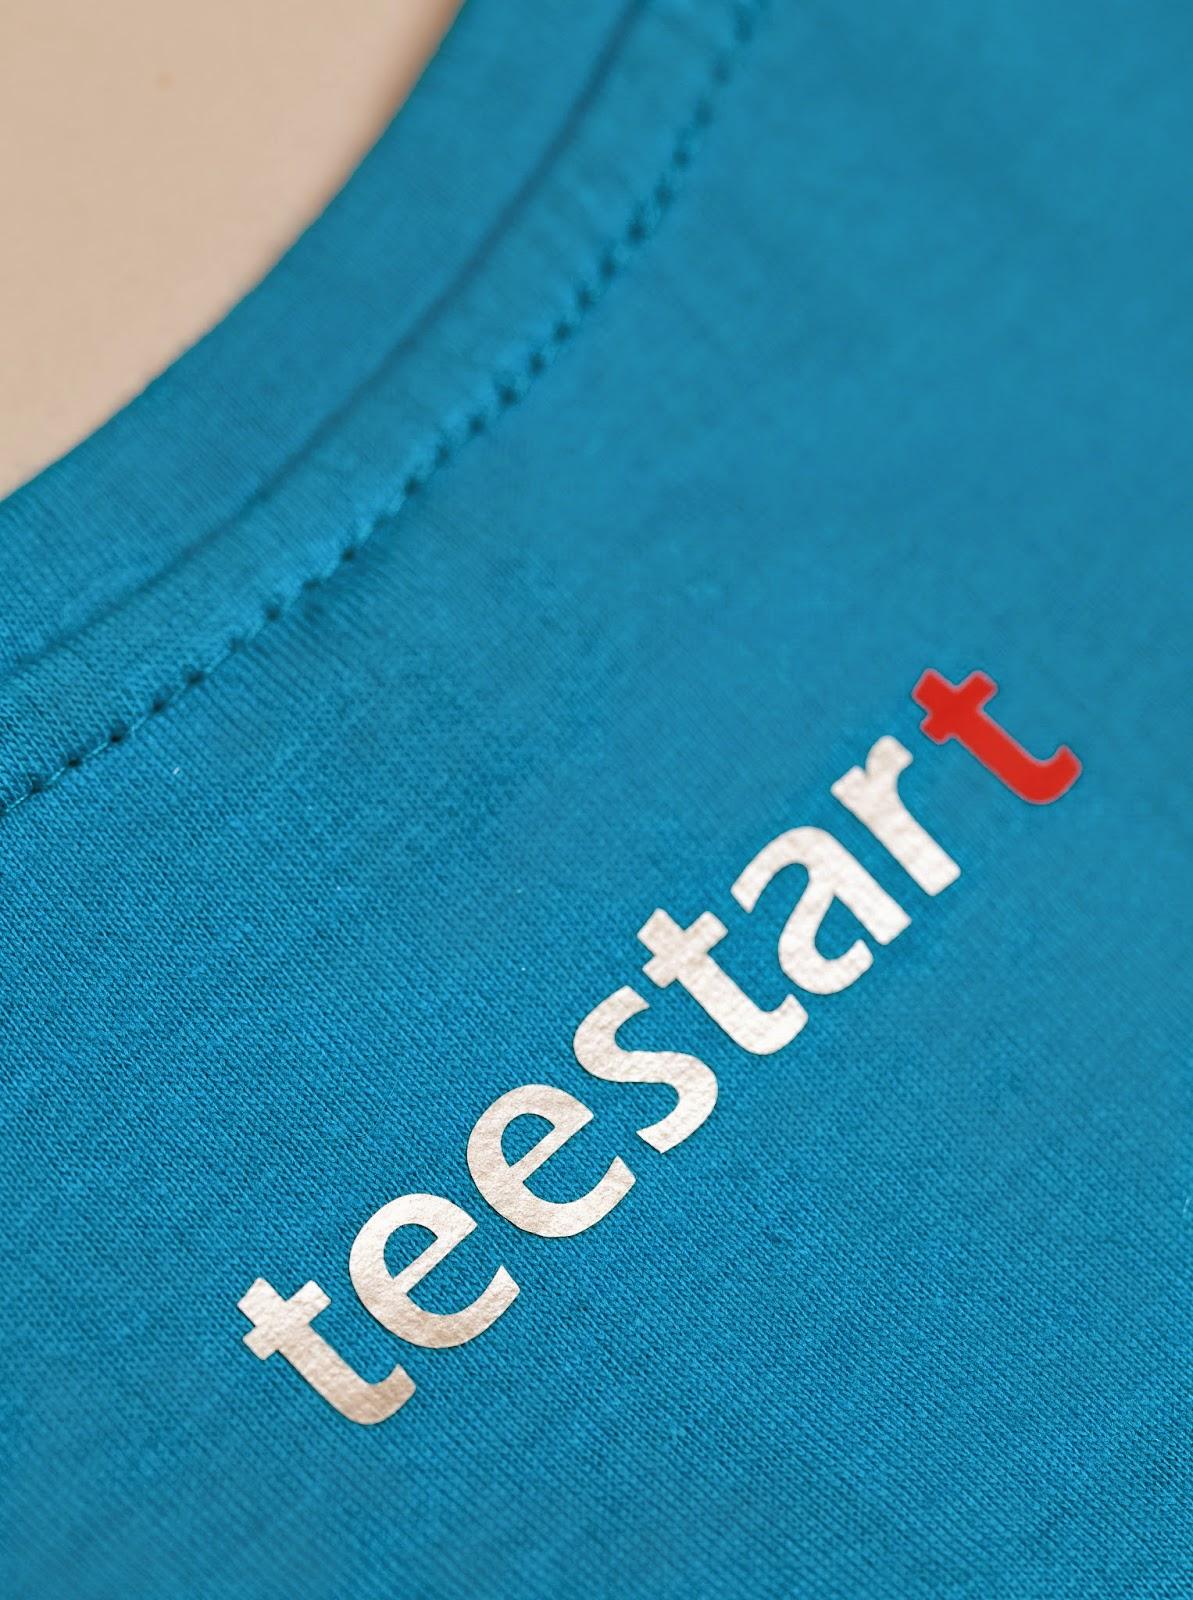 camiseta en edición limitada en azul B Blue Aqua